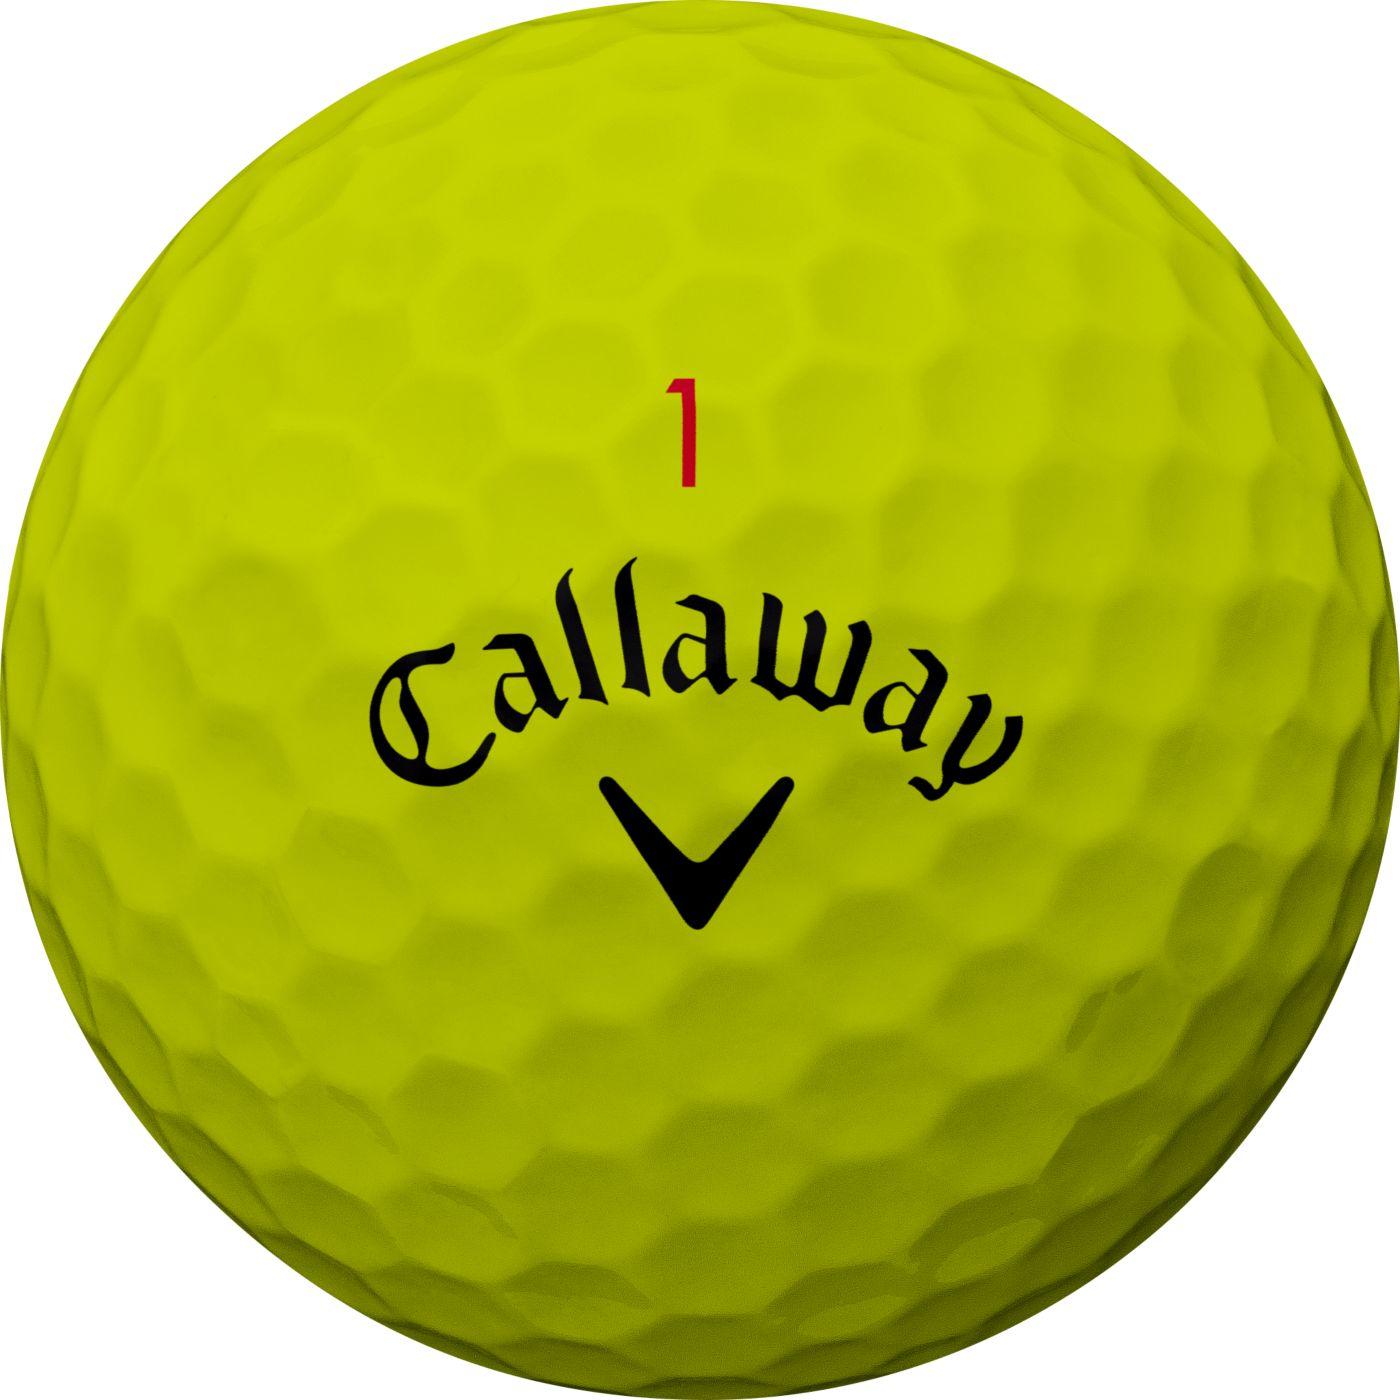 Callaway 2018 Chrome Soft Yellow Golf Balls